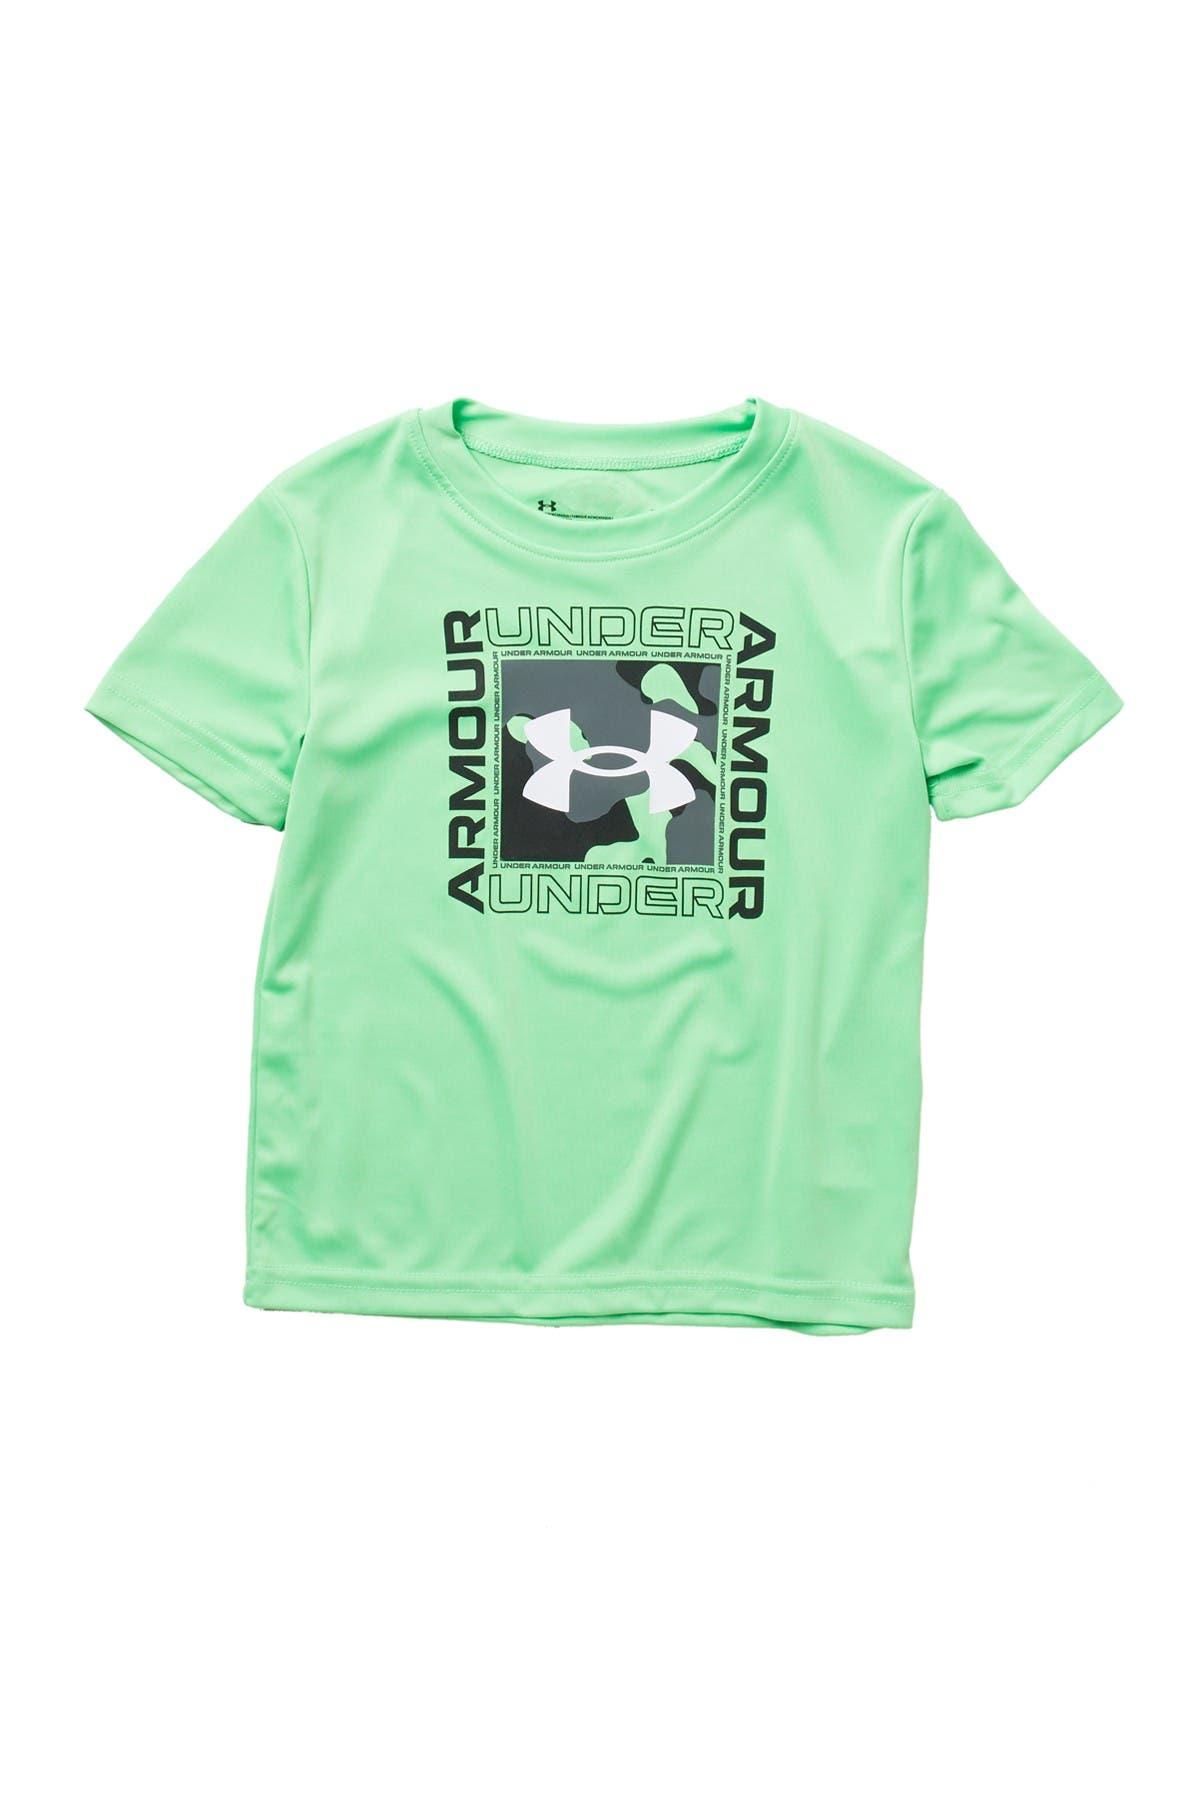 Image of Under Armour Fury Boxed Symbol Short Sleeve T-Shirt